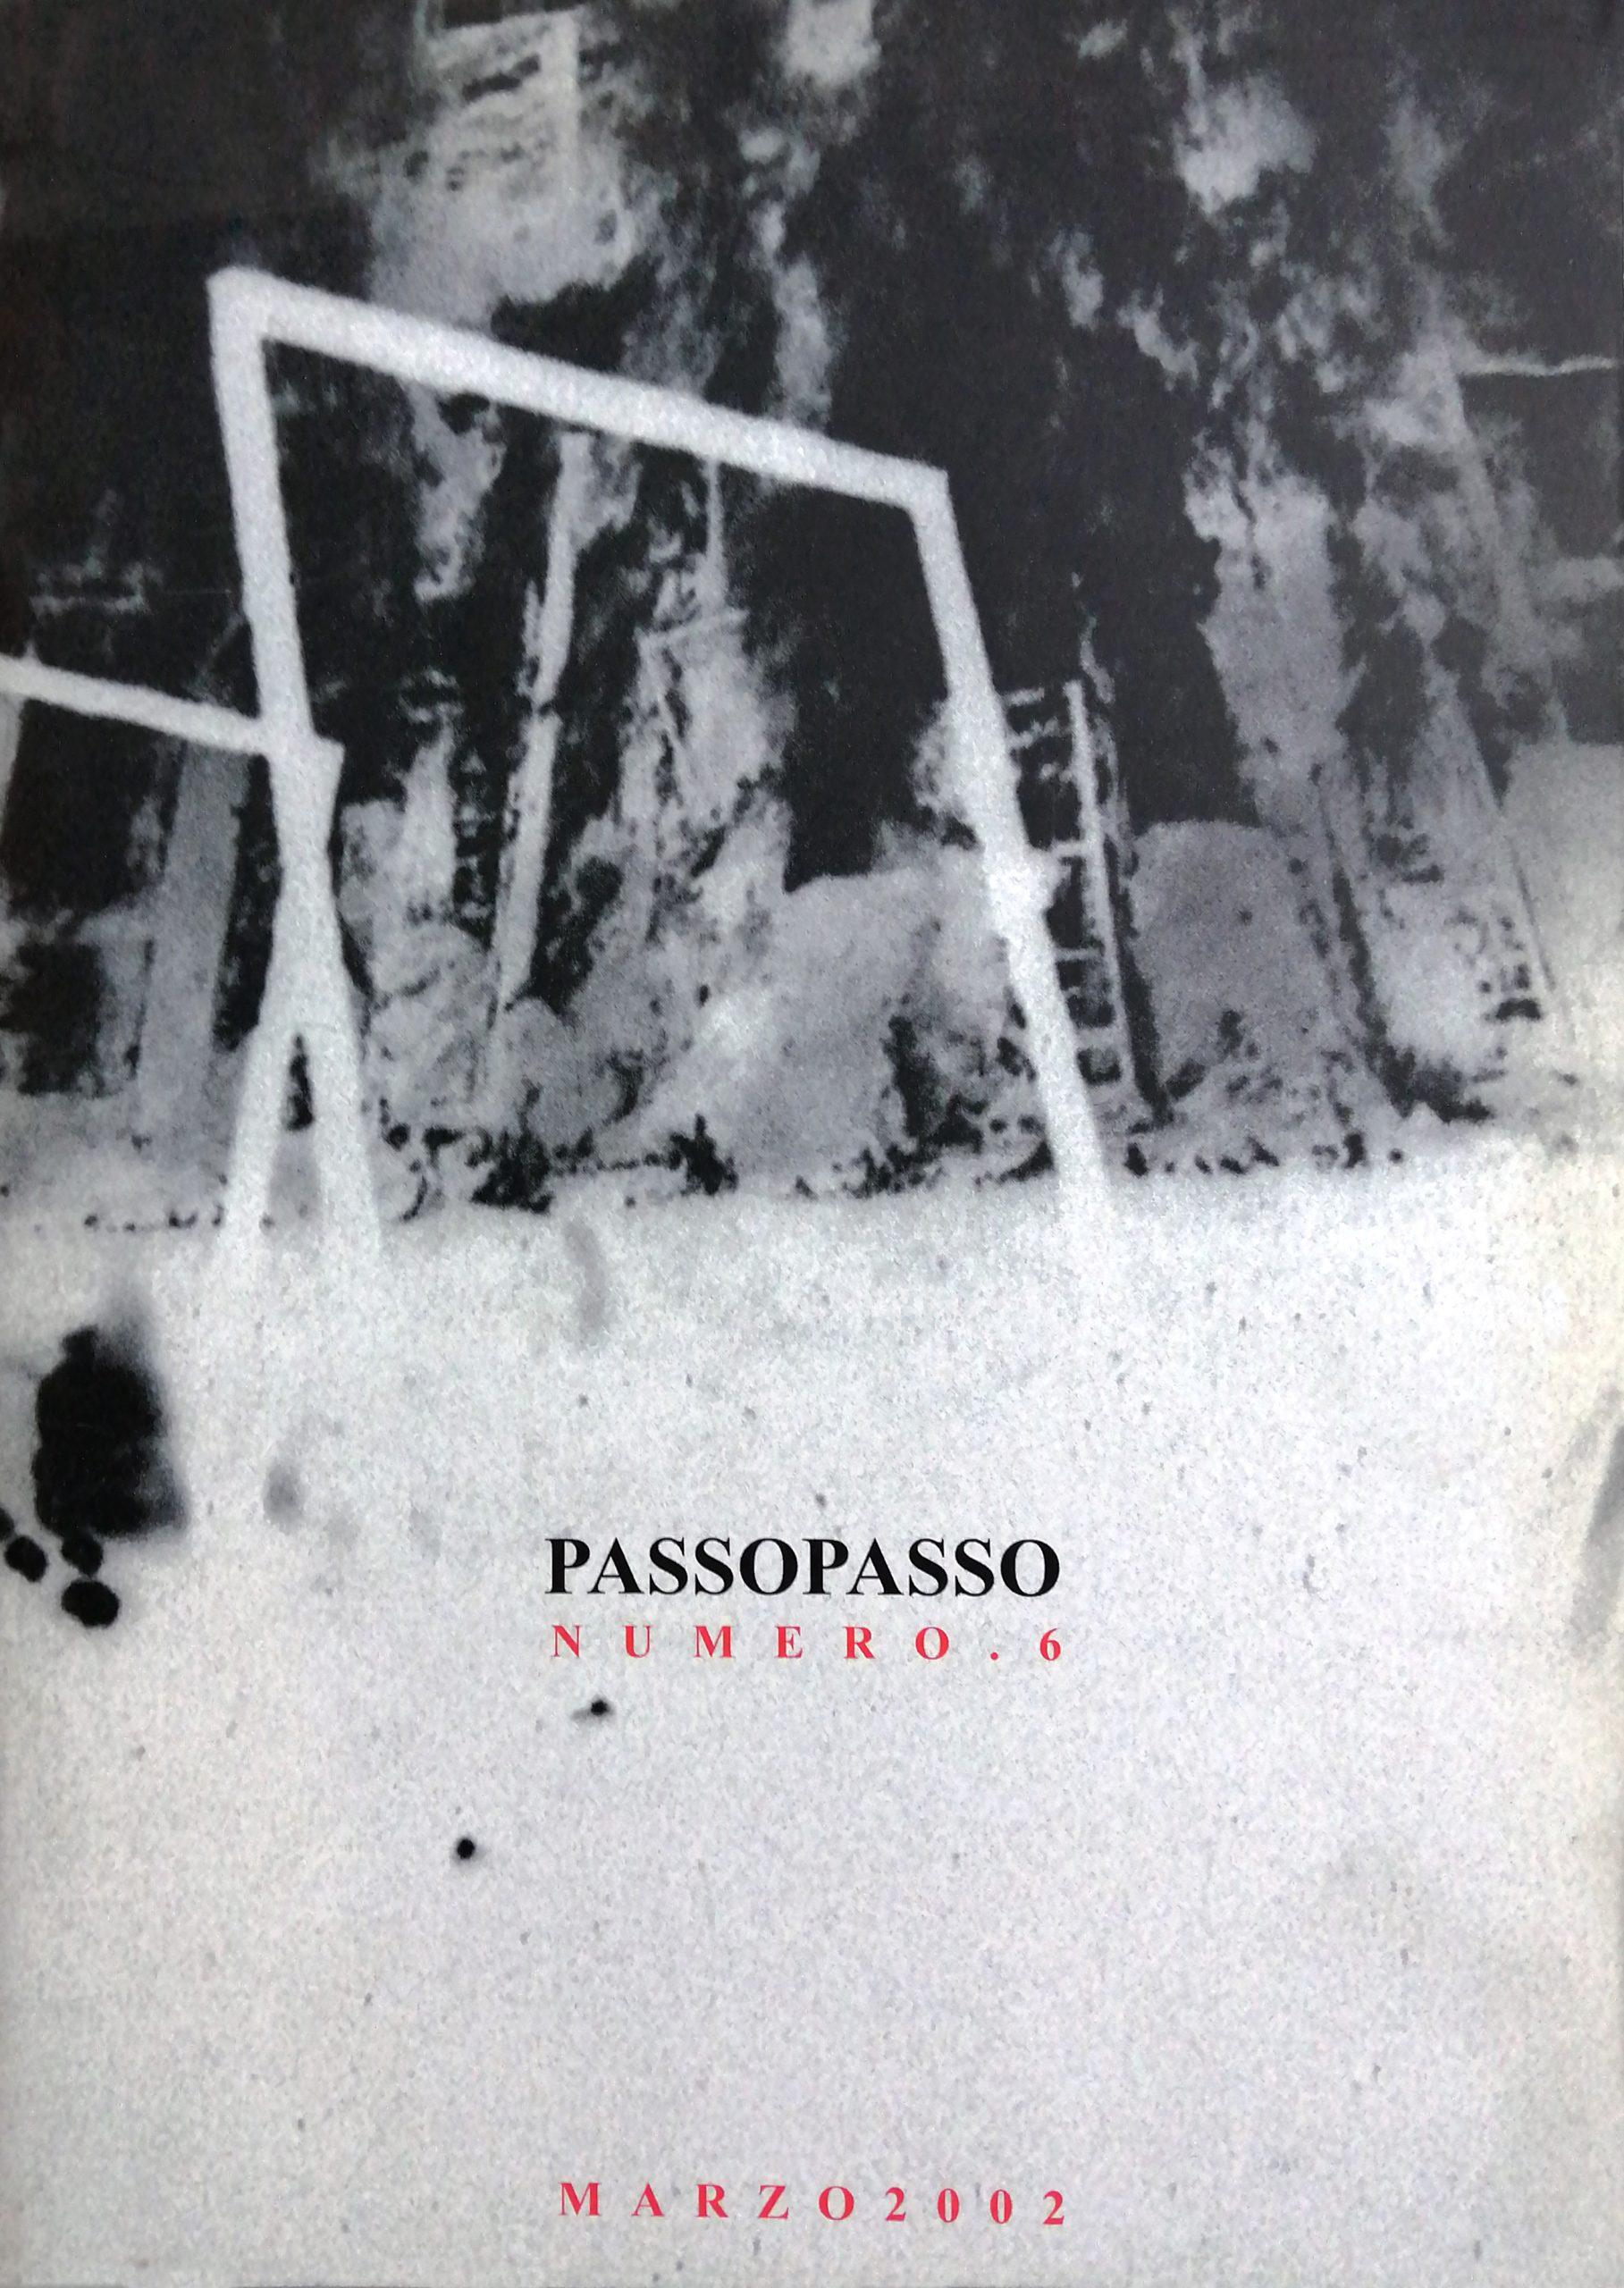 2002 Passopasso 6 rivista catalogo scaled - Bibliography/ Catalogues